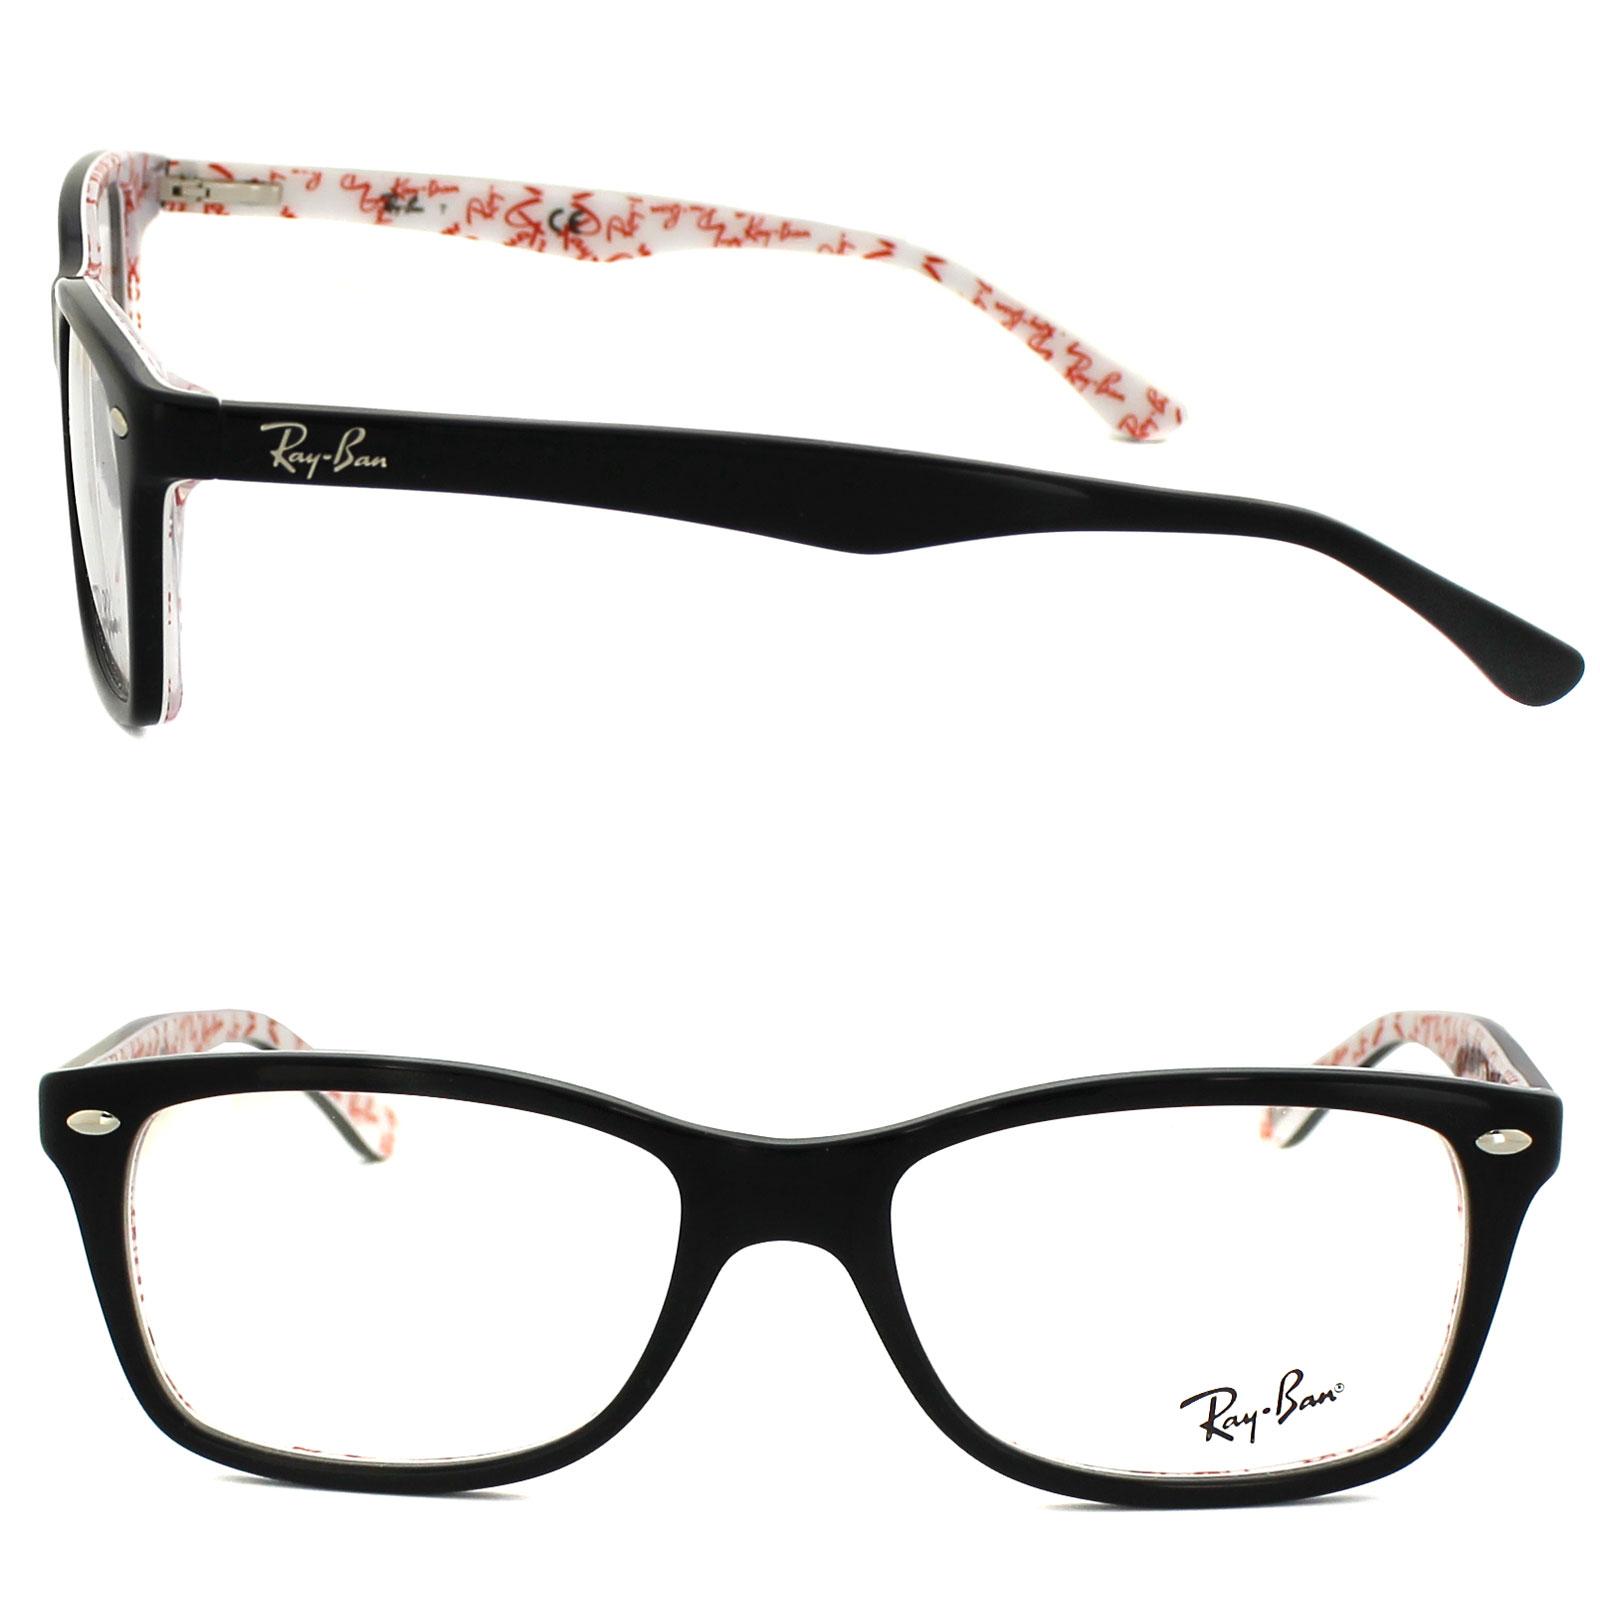 Eyeglass  Definition of Eyeglass by MerriamWebster